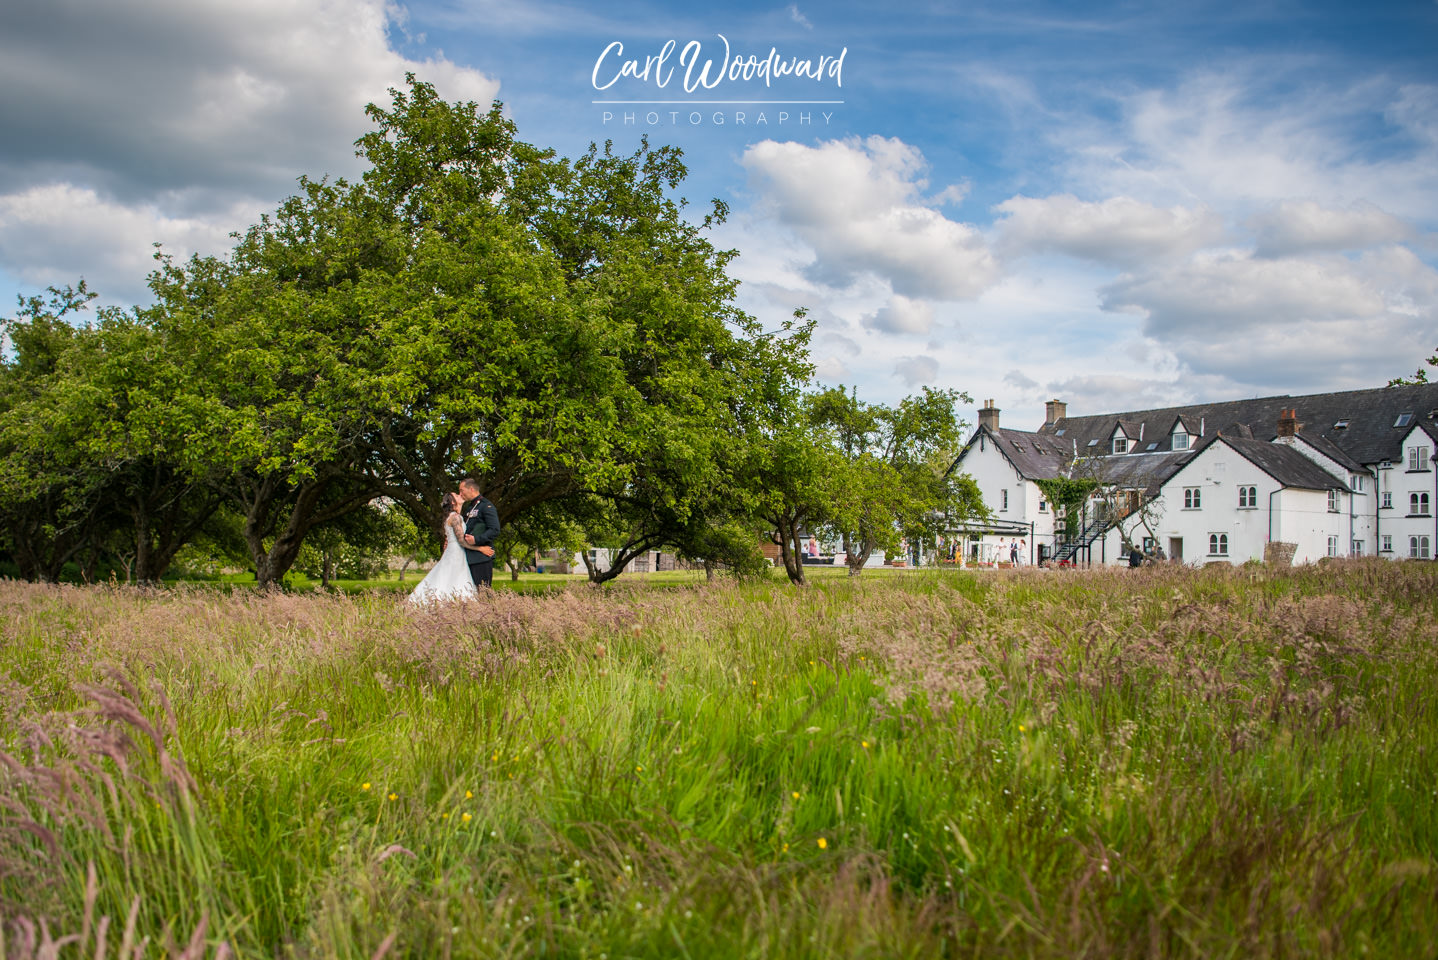 013-The-Old-Rectory-Hotel-Wedding-Photography-Cardiff-Wedding-Photography.jpg